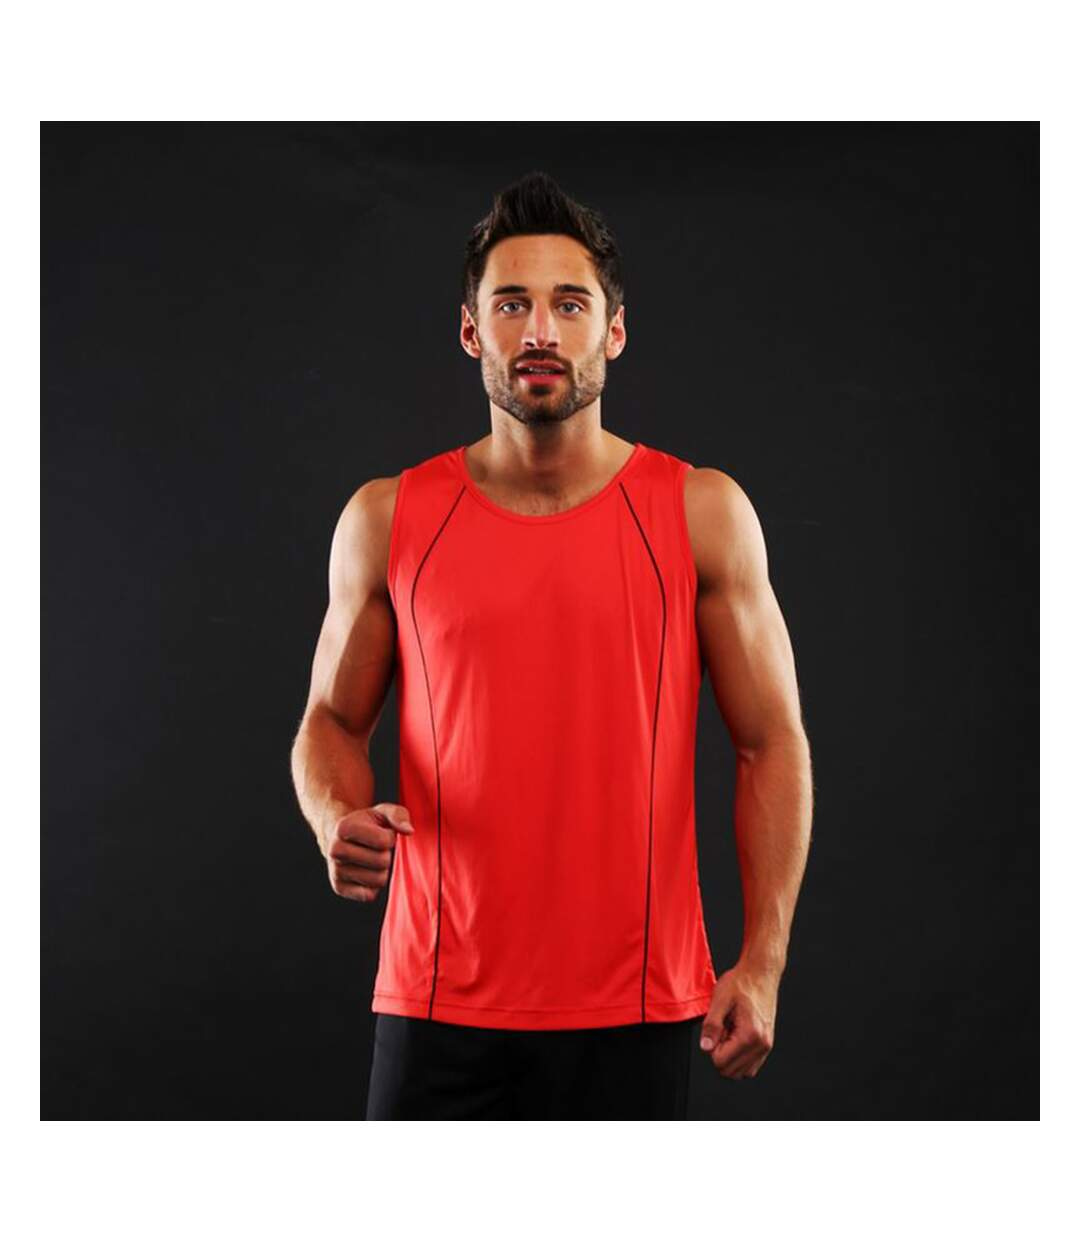 Rhino Mens Rio Sport Rugby Vest (Red/ Black) - UTRW4413